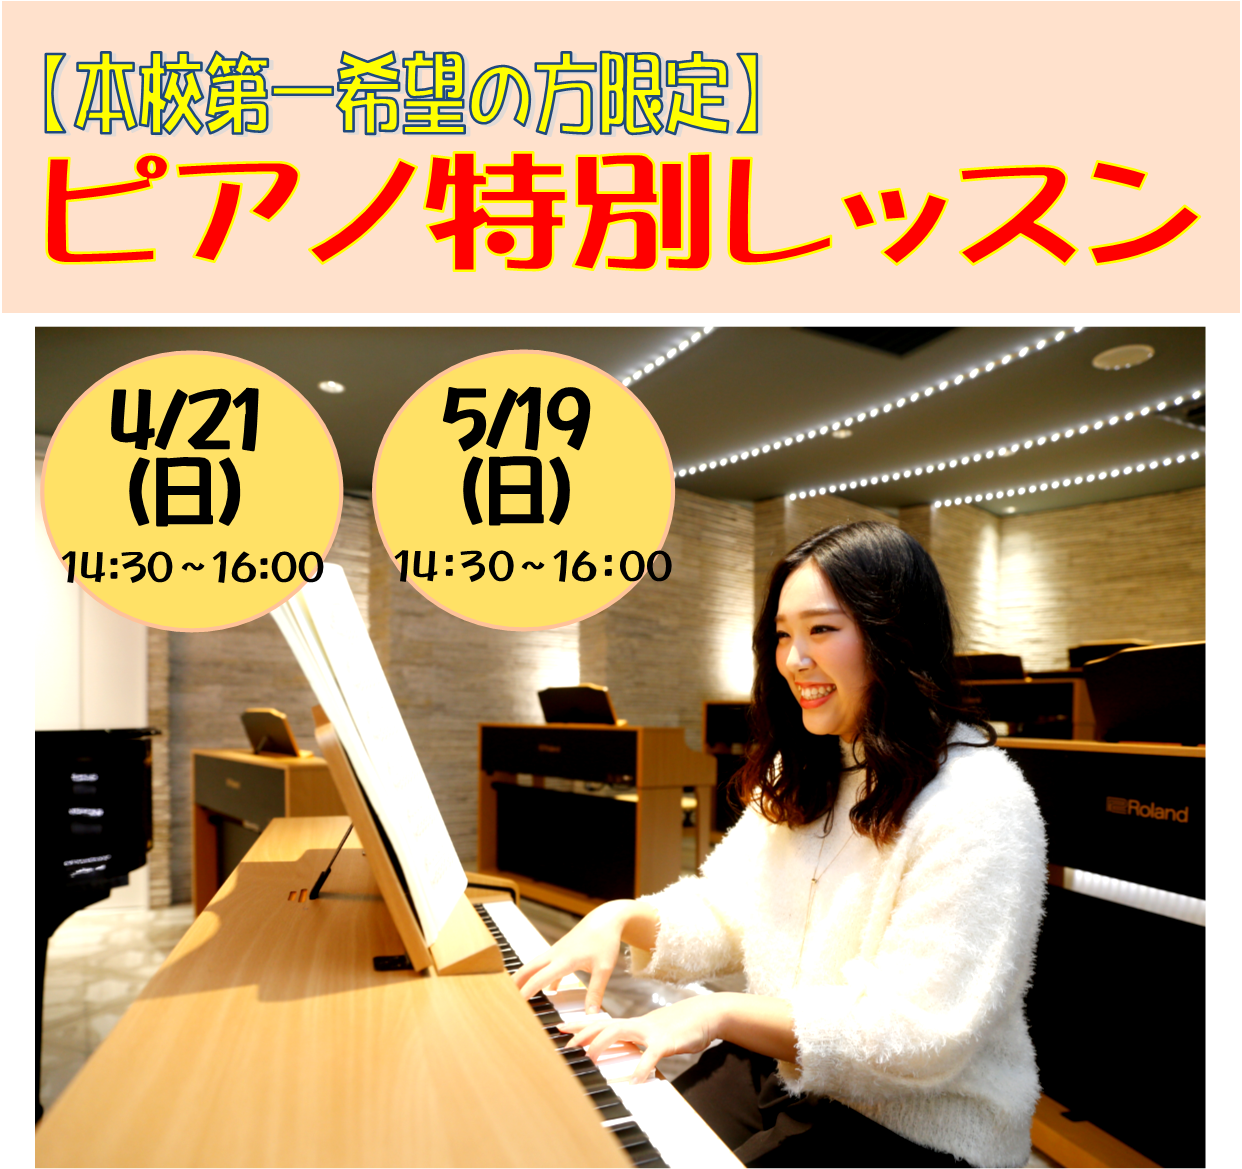 【AO受験予定者向け】ピアノ特別レッスン